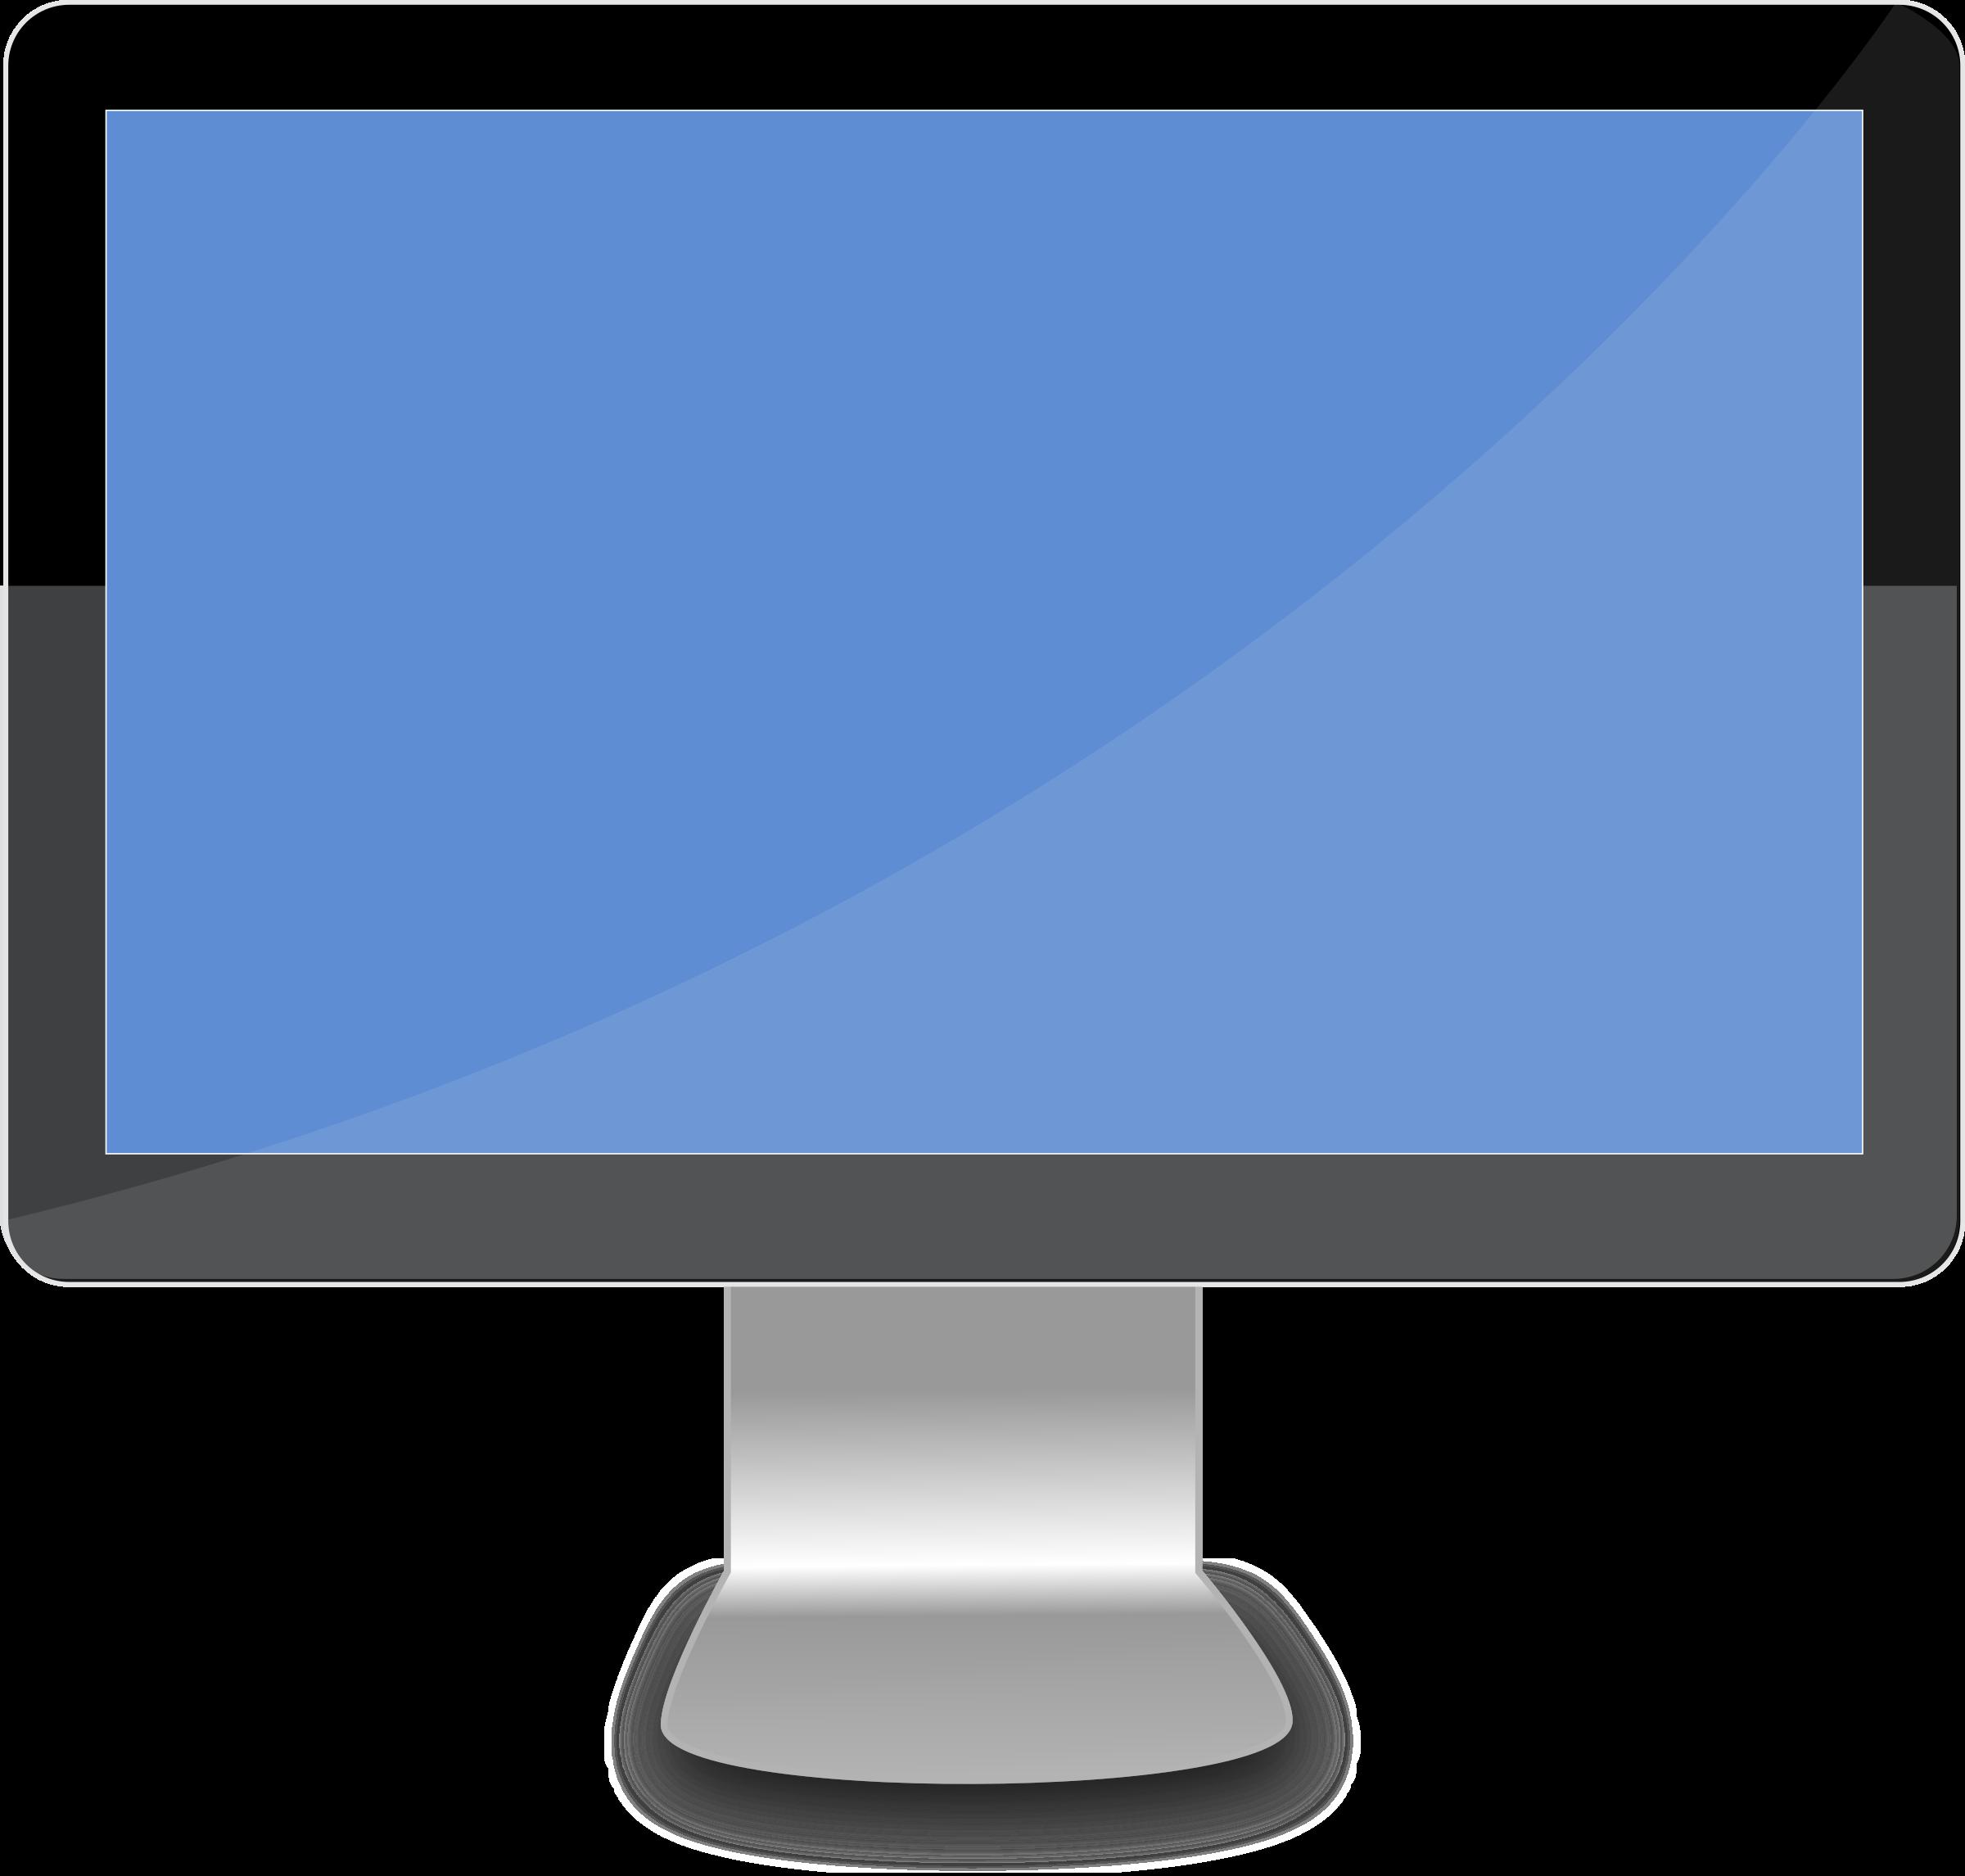 Desktop wallpapers hd backgrounds. Clipart desk wallpaper